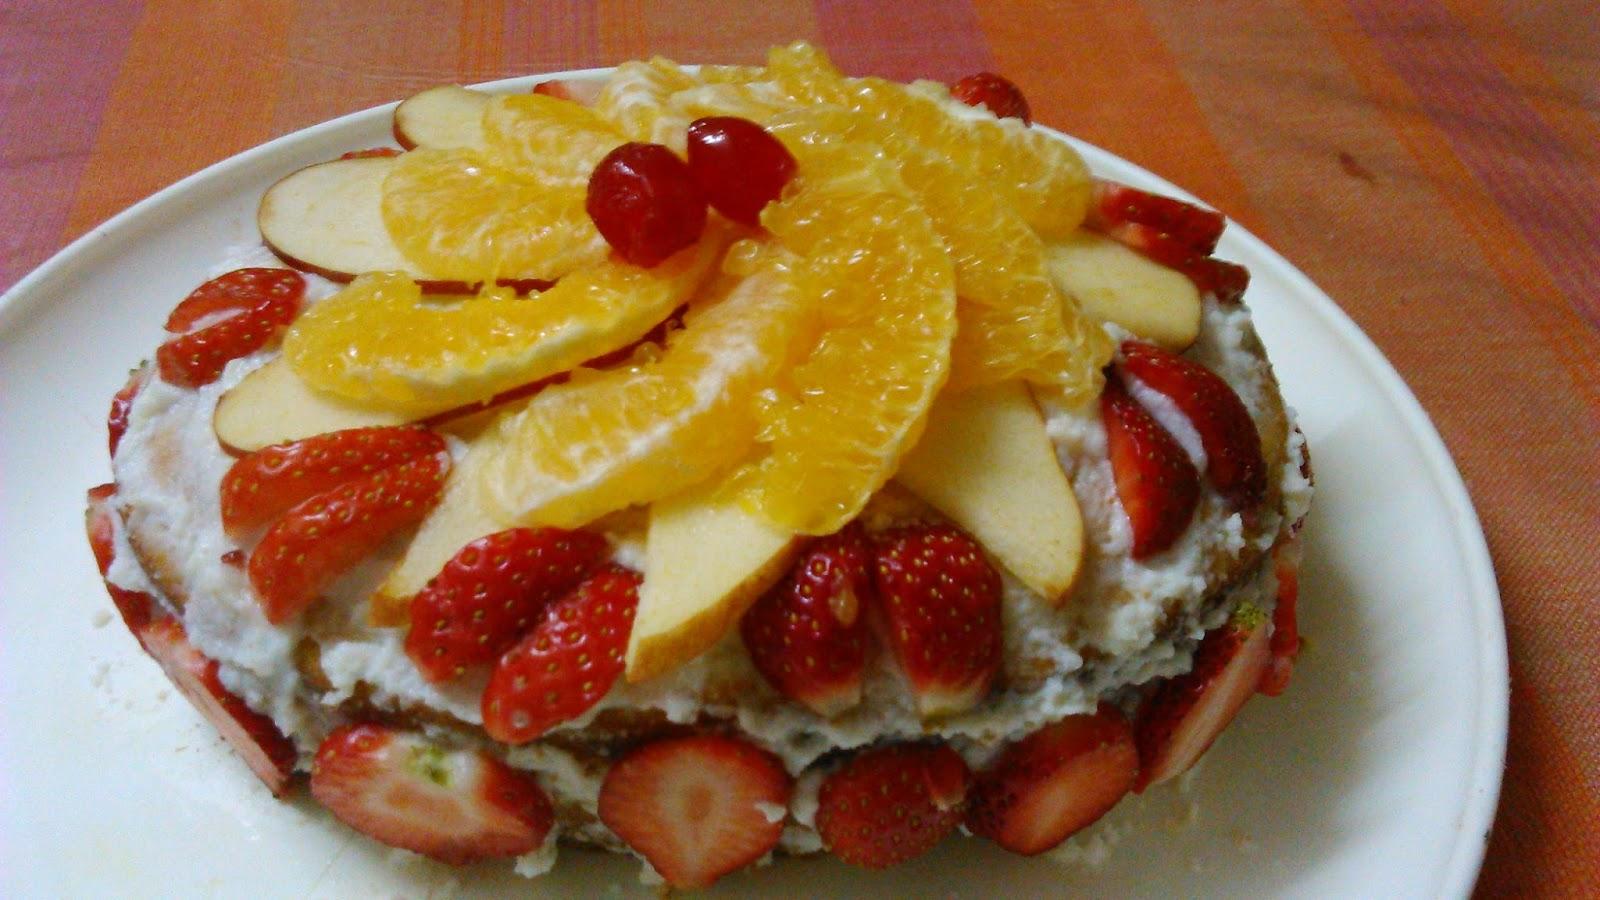 Jhatpat Simple Recipes: Eggless Fresh Fruit Cake